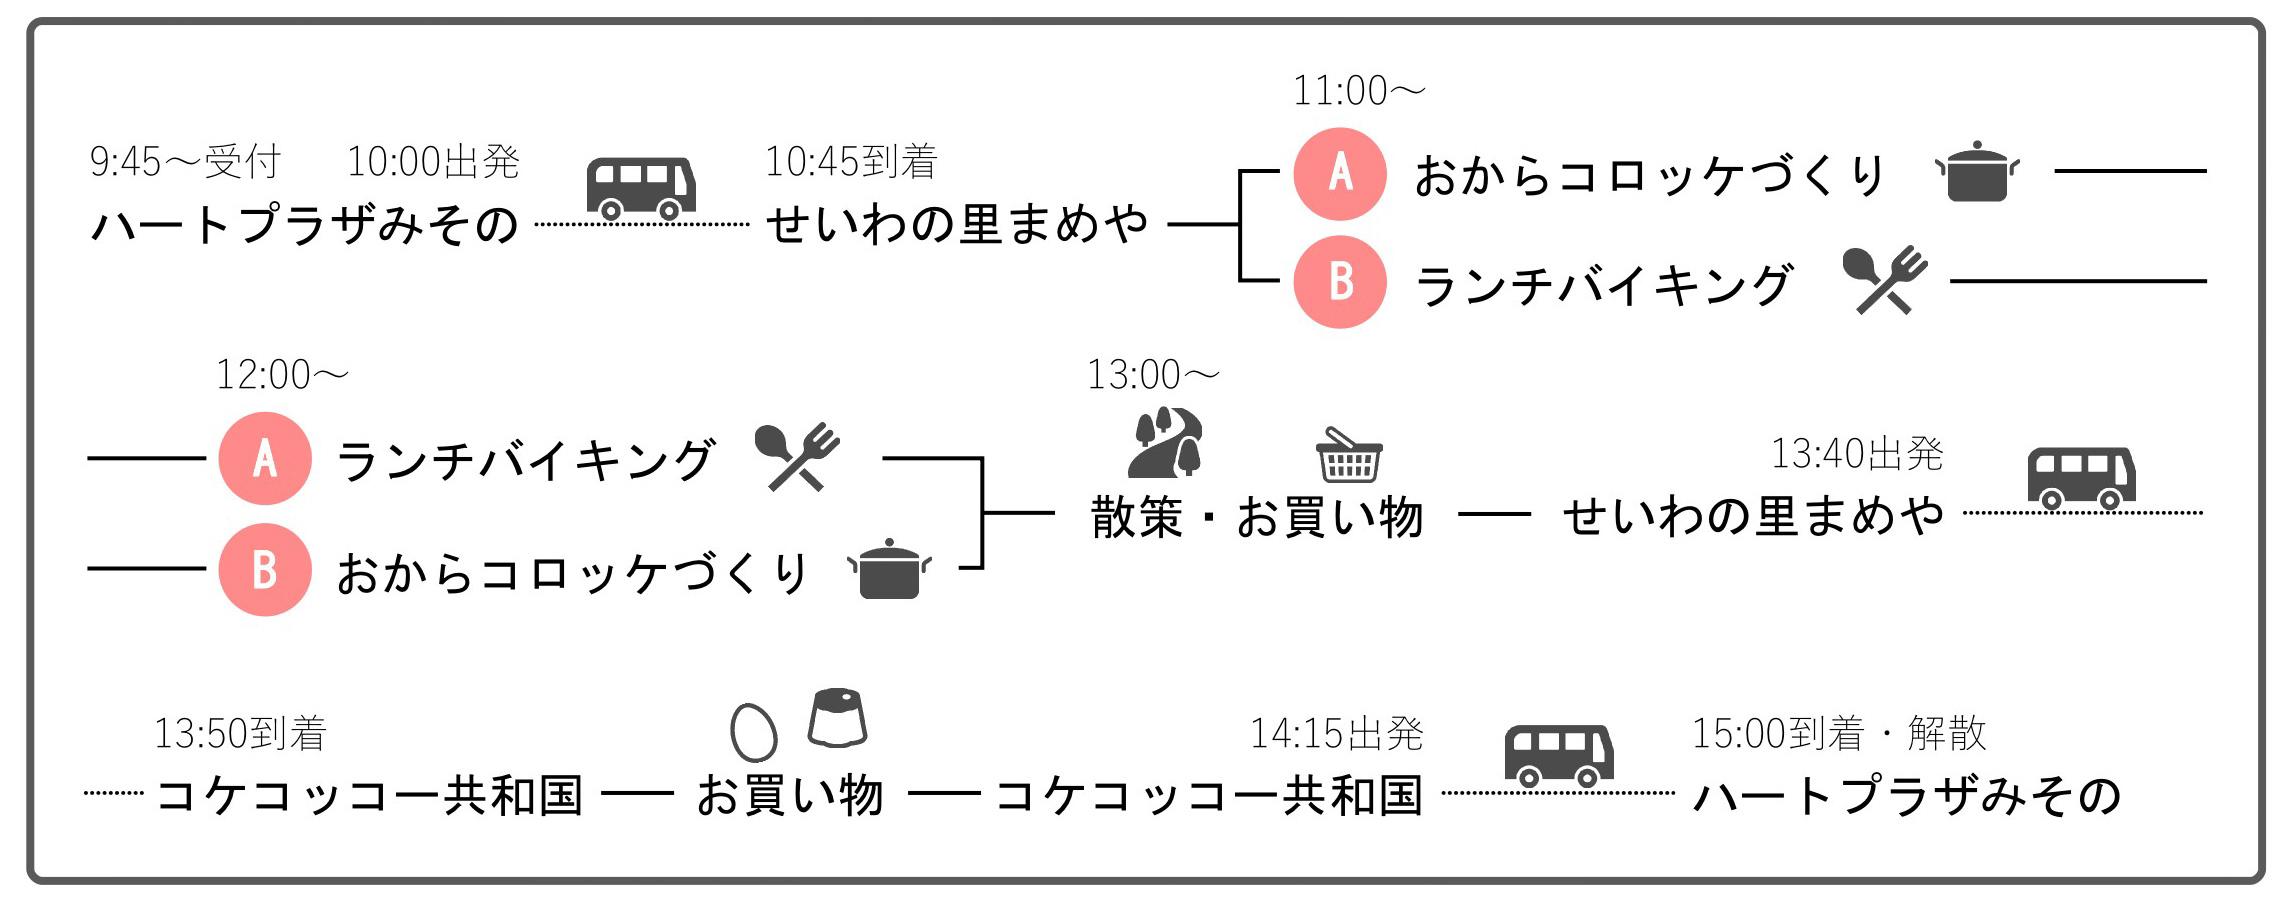 令和元年10月9日の行程表